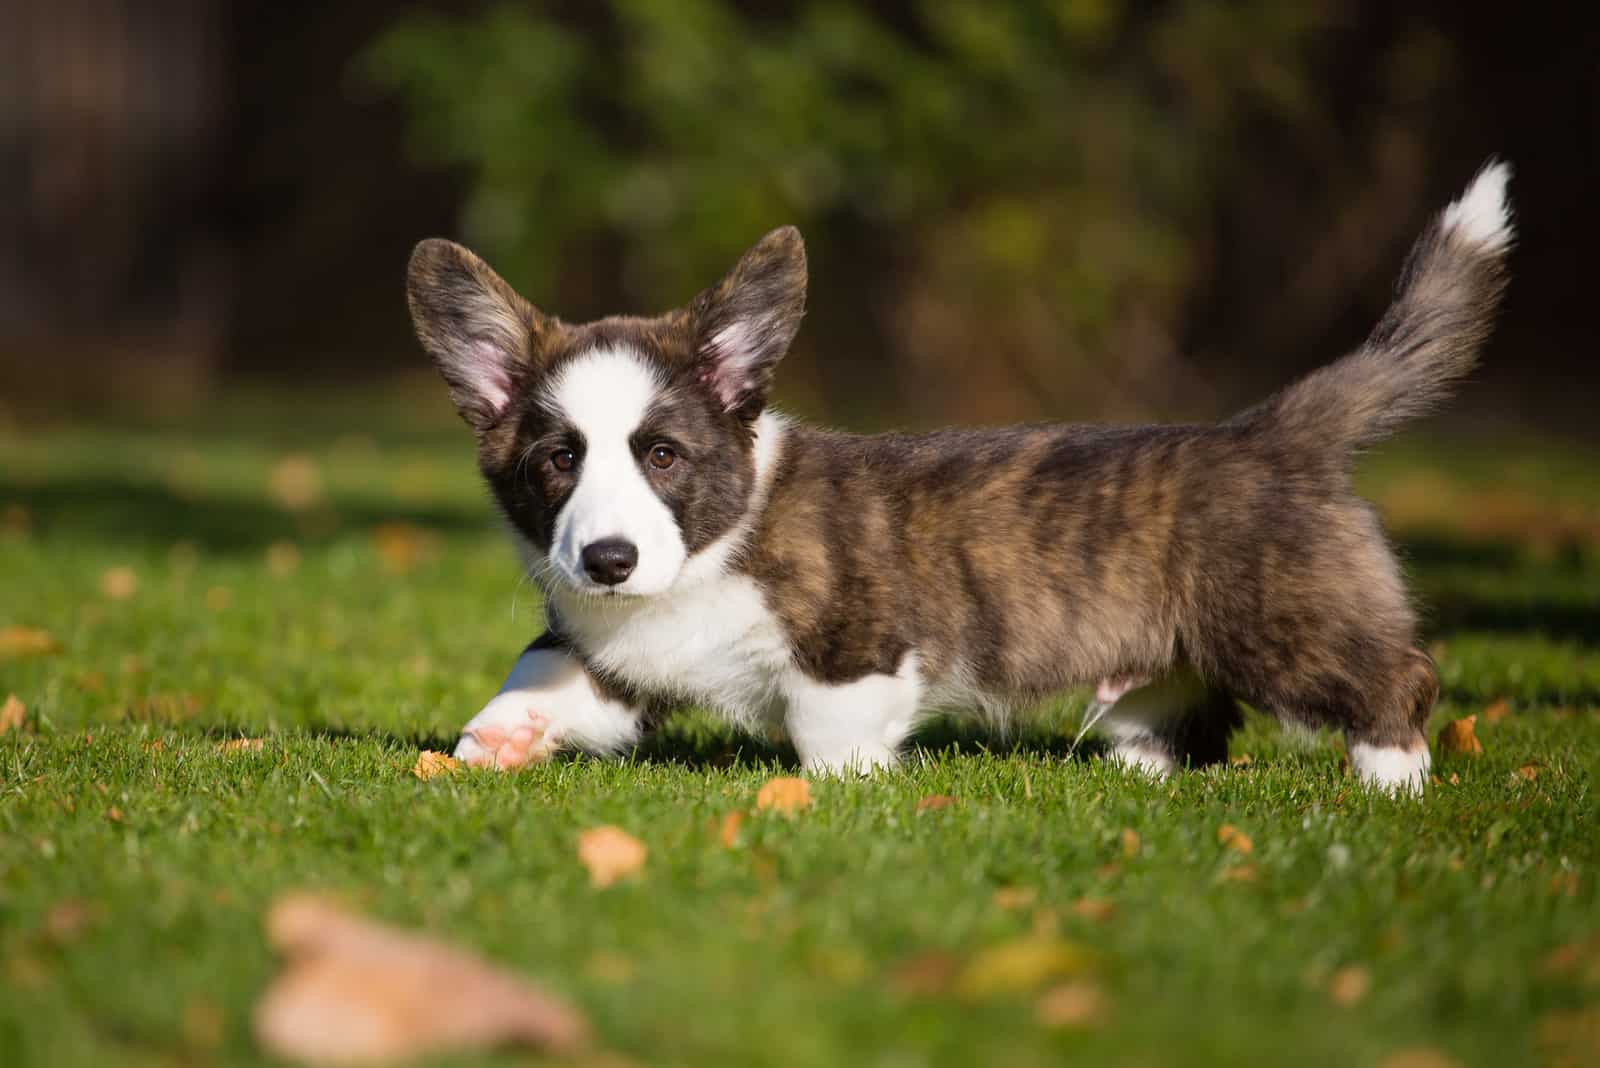 Brindle Welsh Corgi Cardigan puppy on a grass